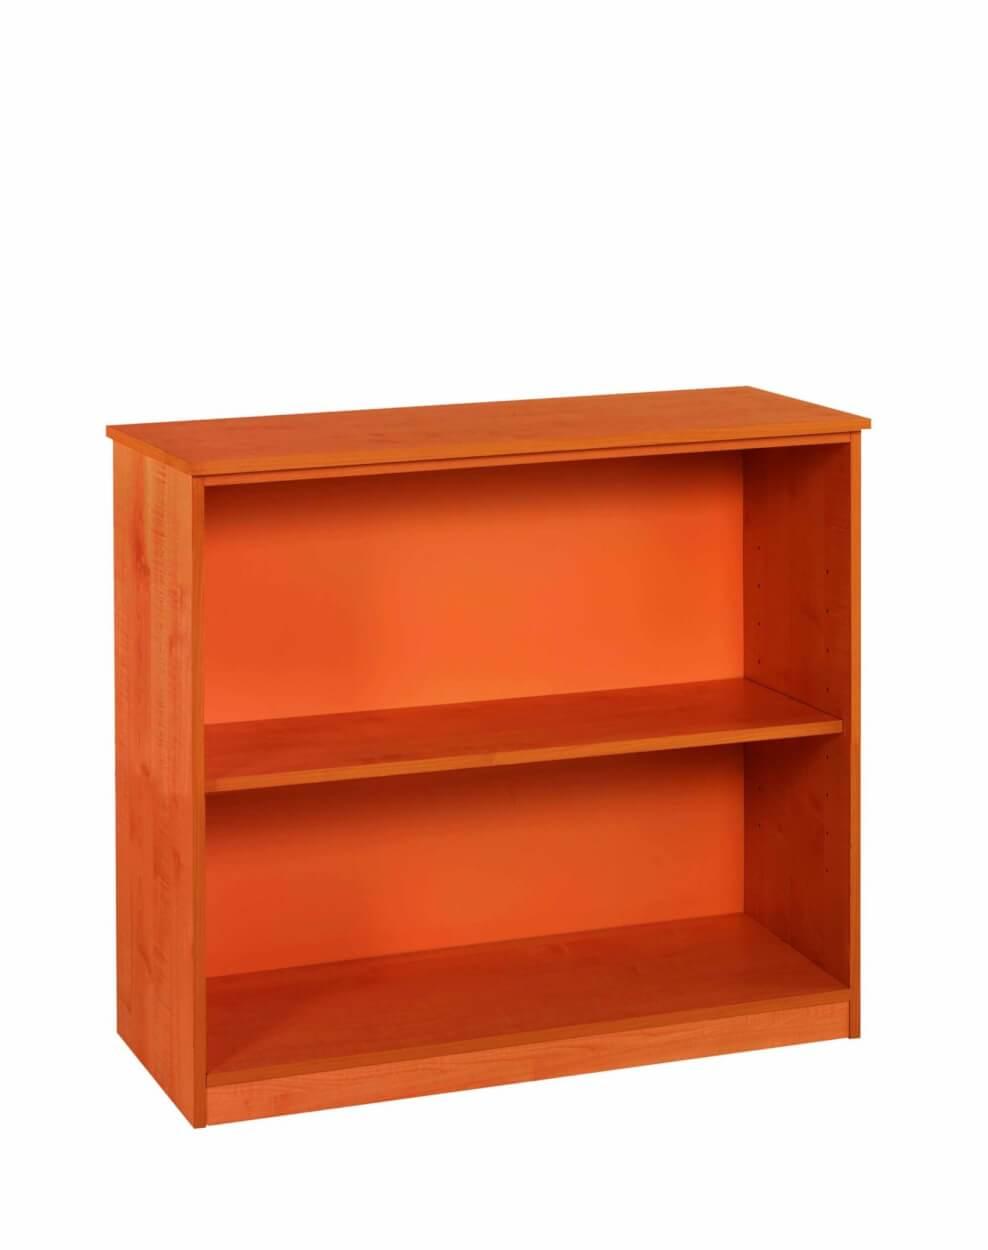 2 Tier Oppen Bookcase